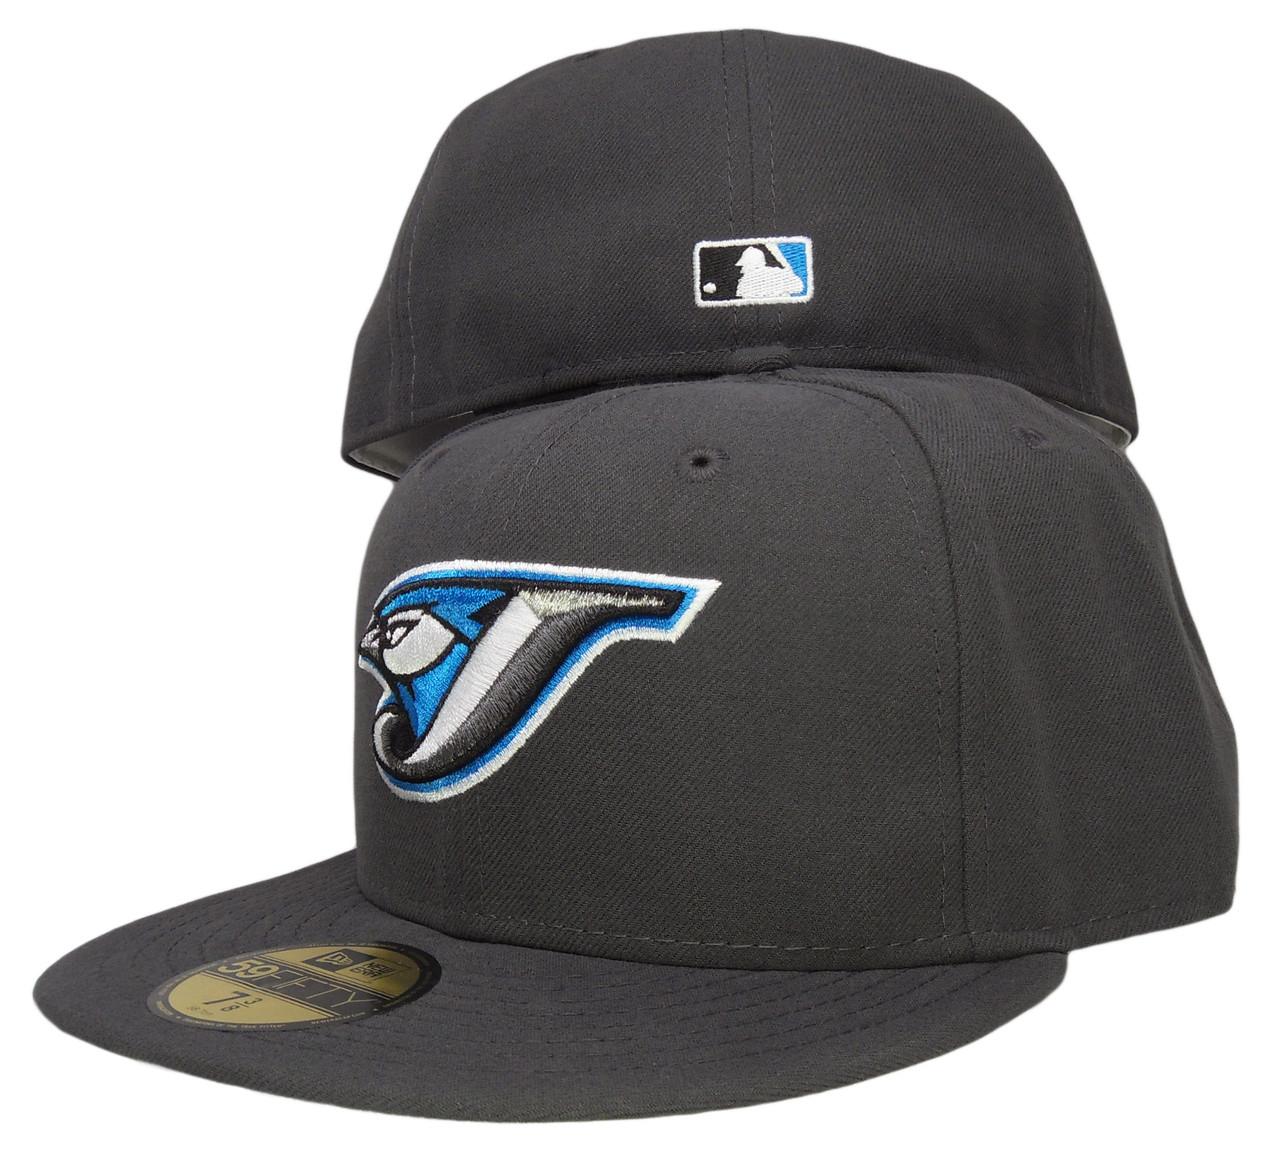 buy popular 68e4b 88323 ... usa toronto blue jays new era gray bottom fitted hat graphite gray  marine blue. larger ...